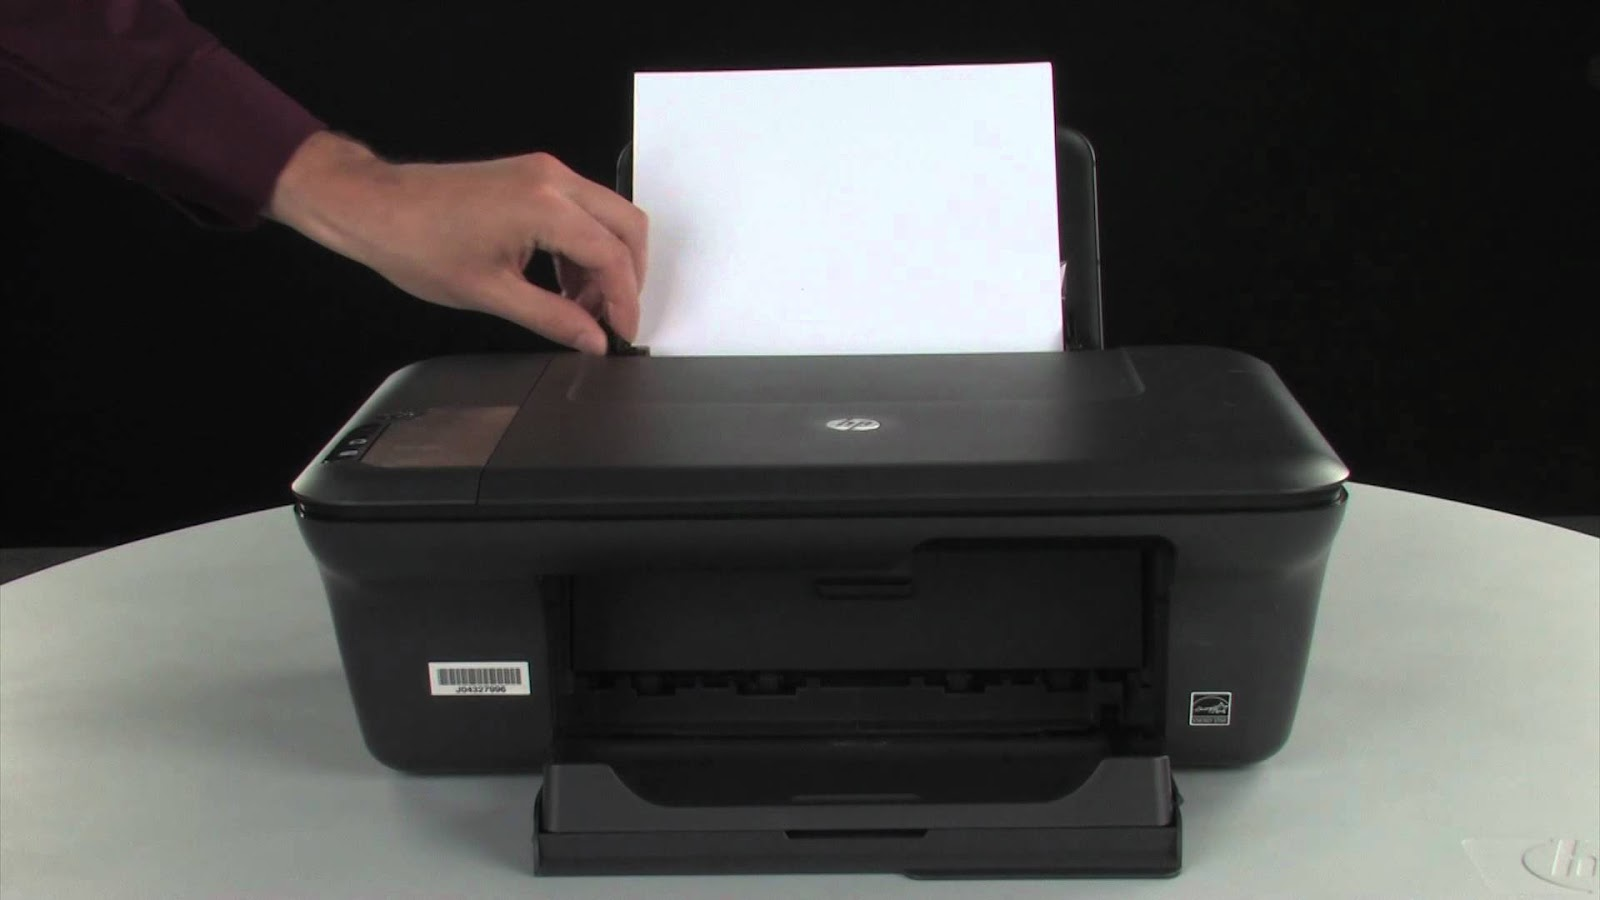 Spesifikasi Dan Harga Printer Hp Deskjet 2060 All In One